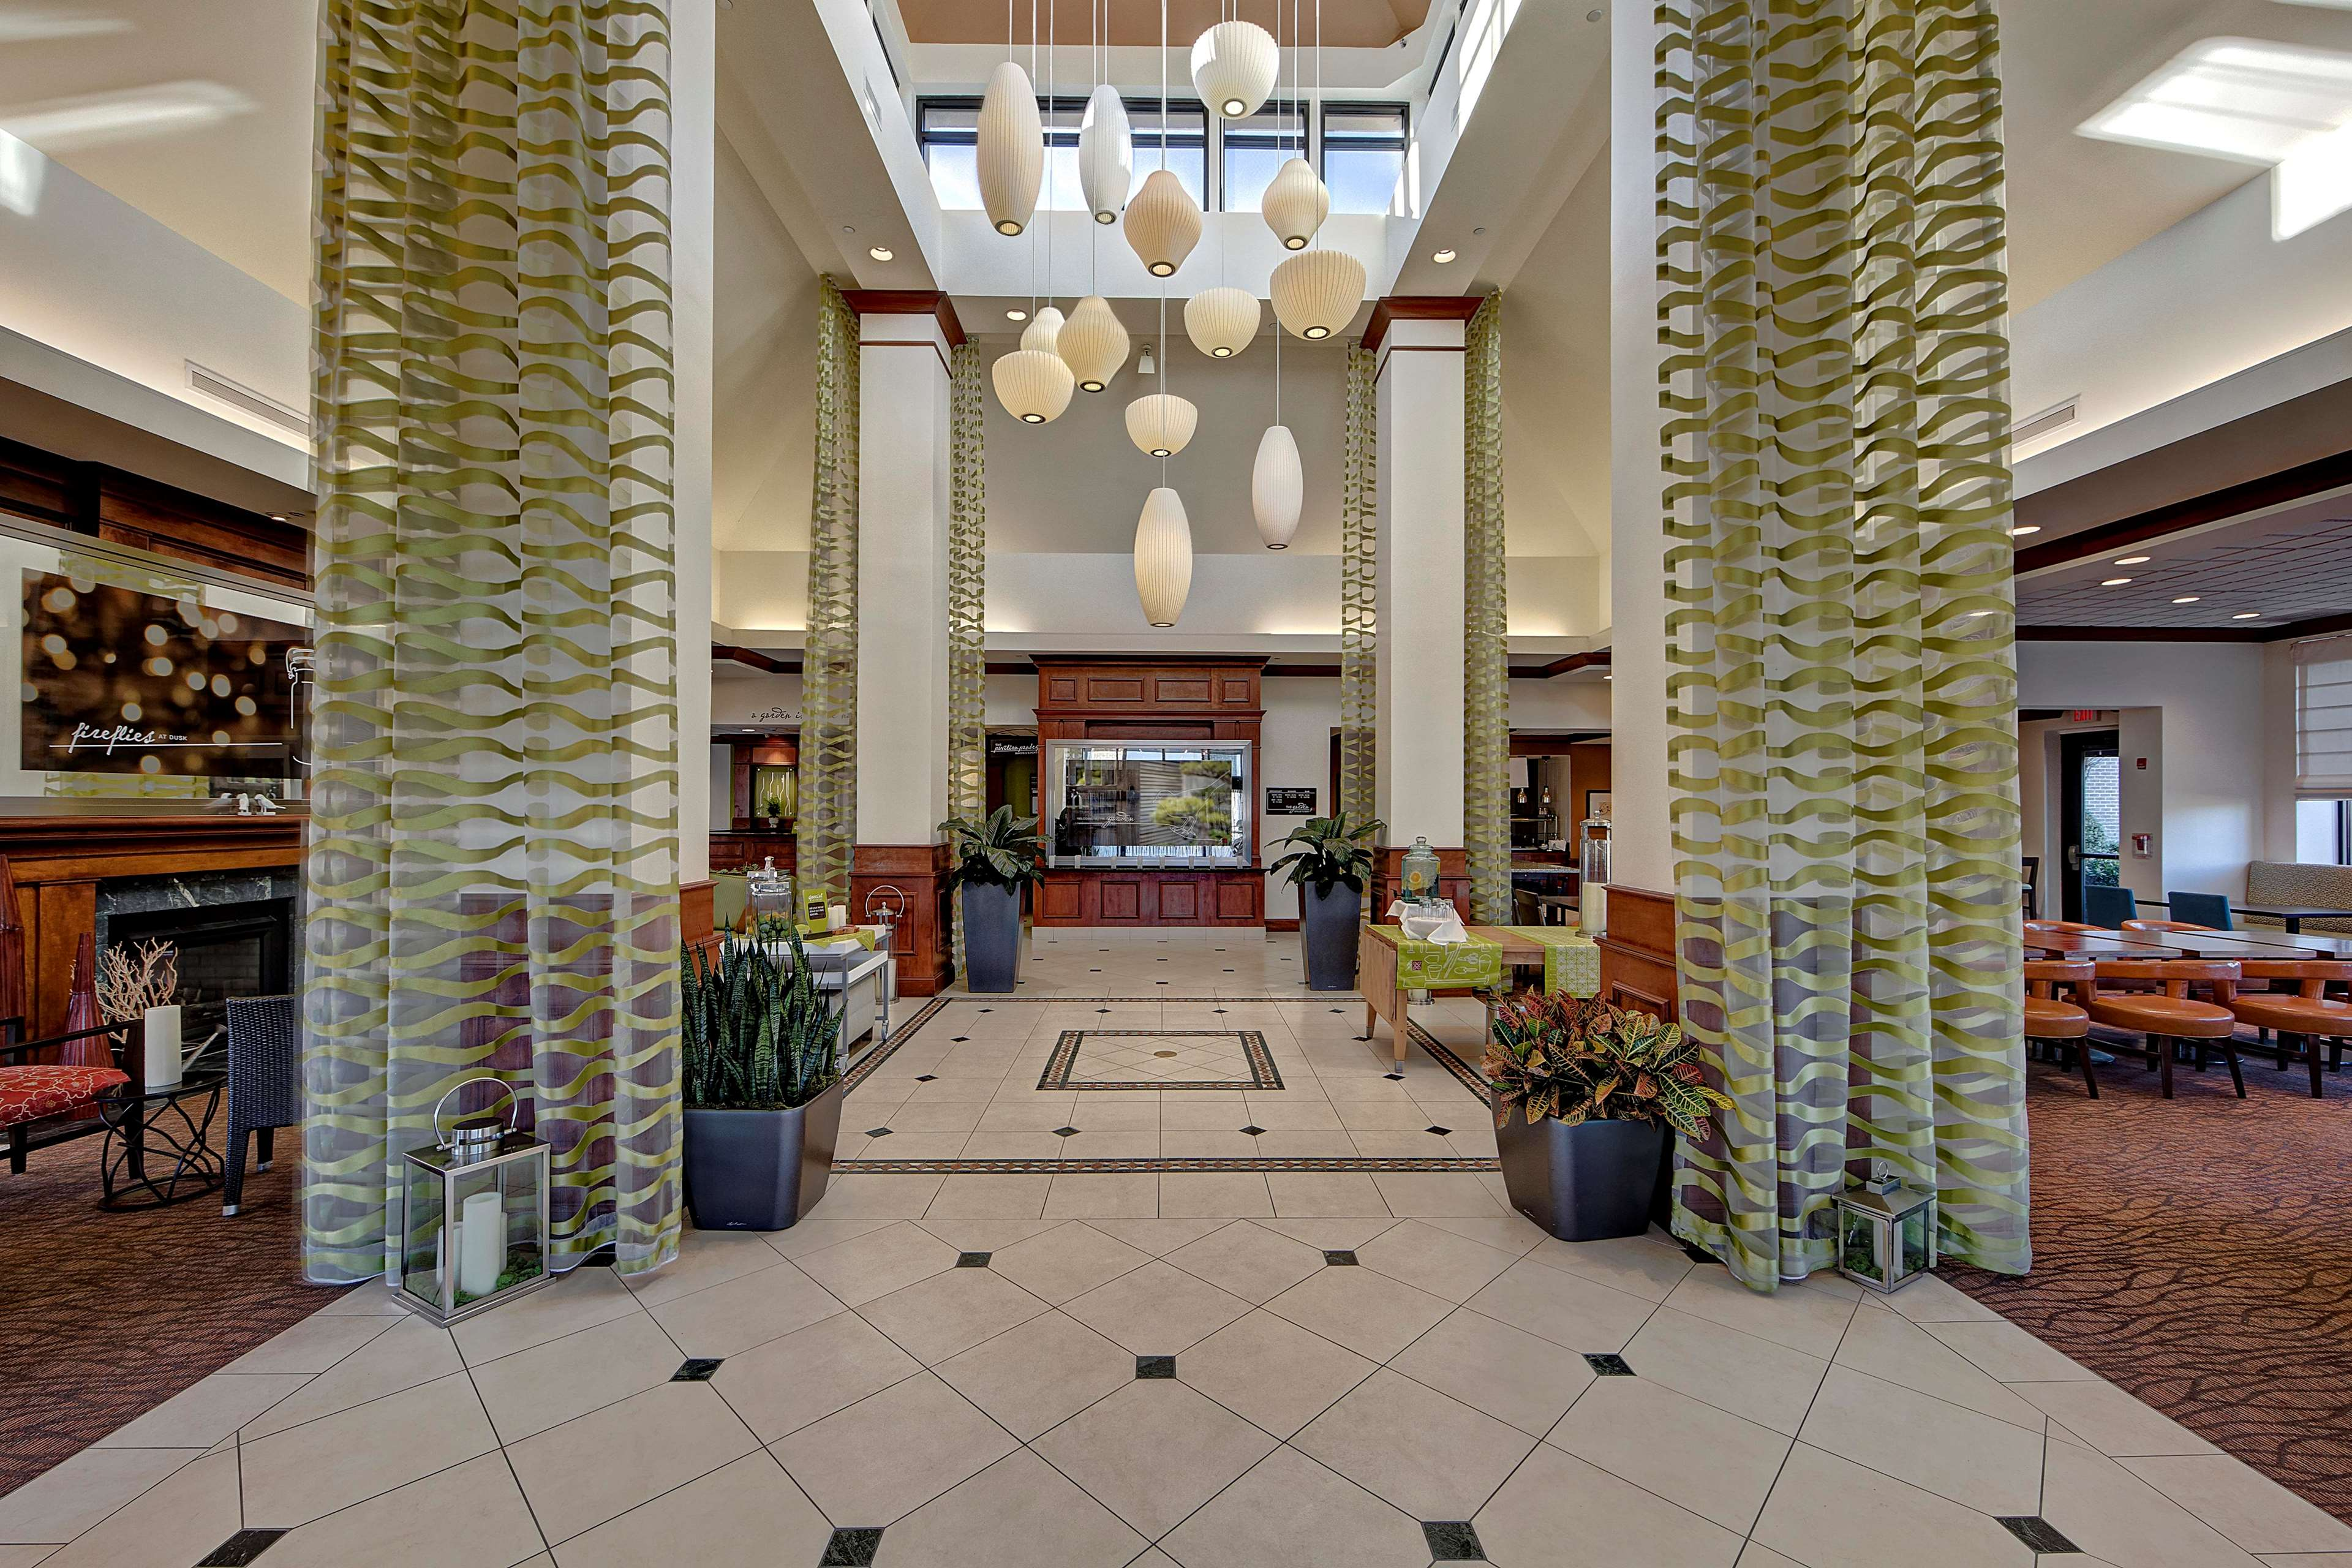 Hilton Garden Inn Memphis/Southaven, MS image 22